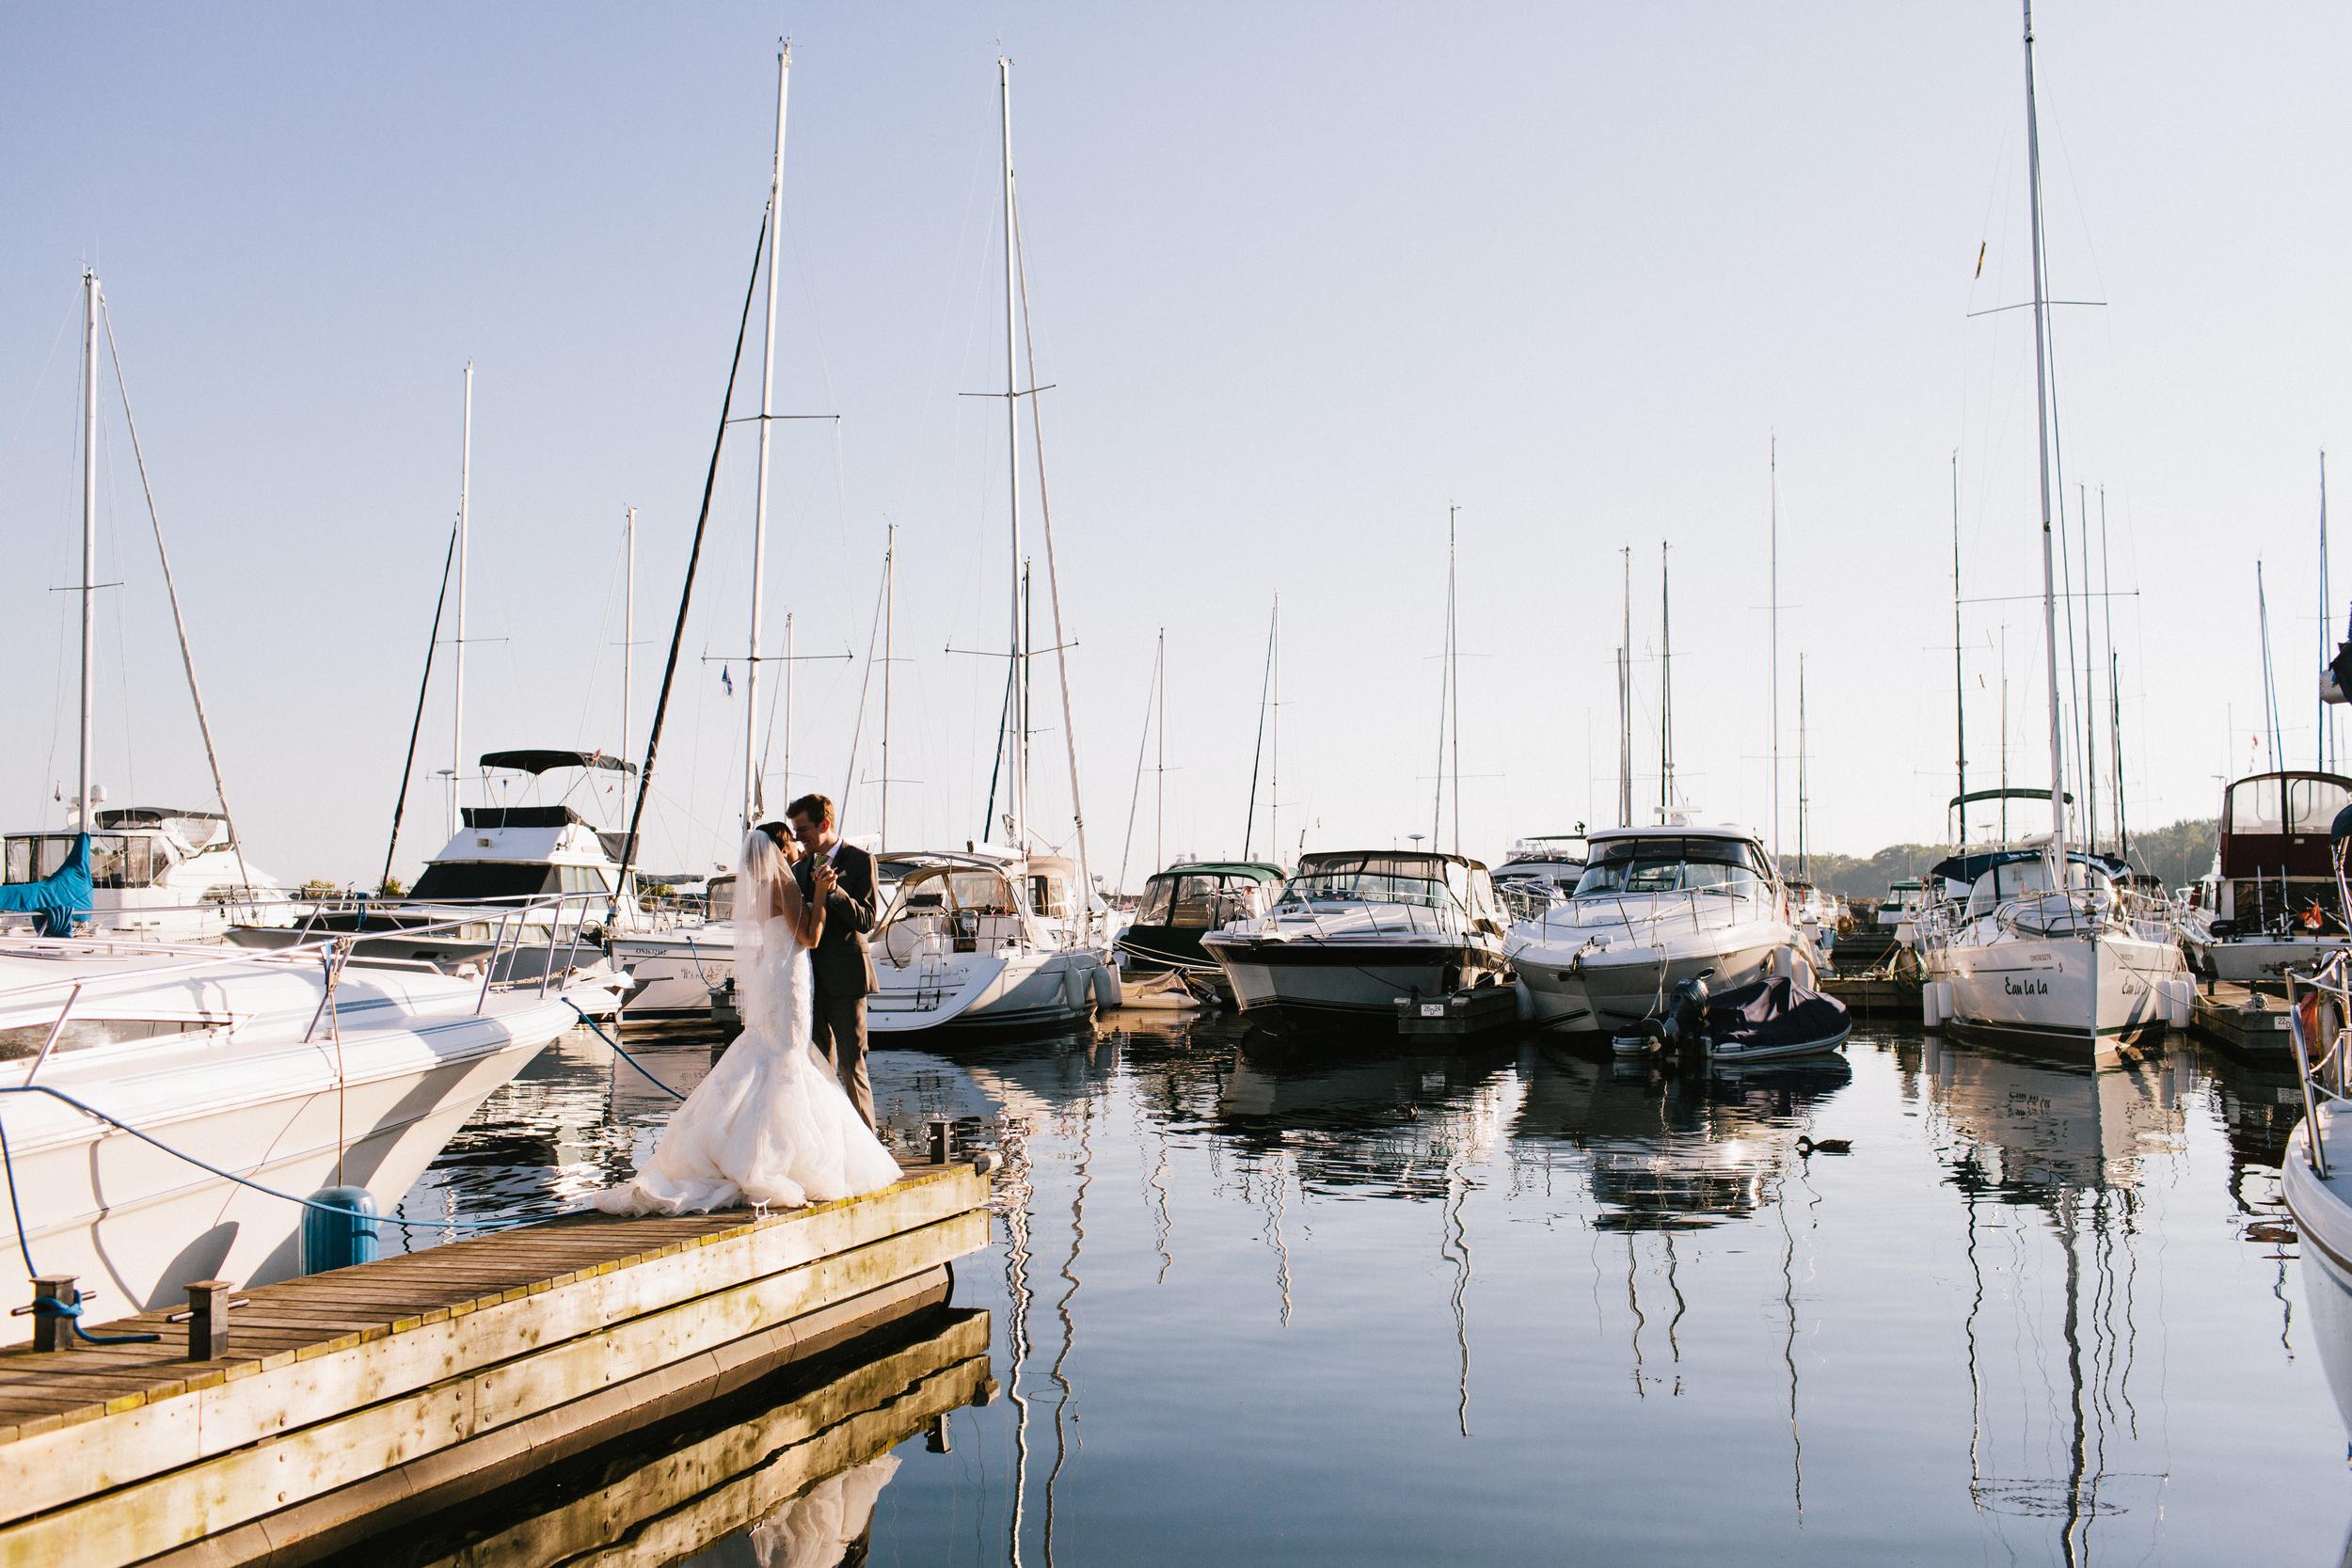 harbour-banquet-hall-oakville-wedding-photographer-michael-rousseau-photography-persian-wedding-photographer-isabella-daniel042.JPG